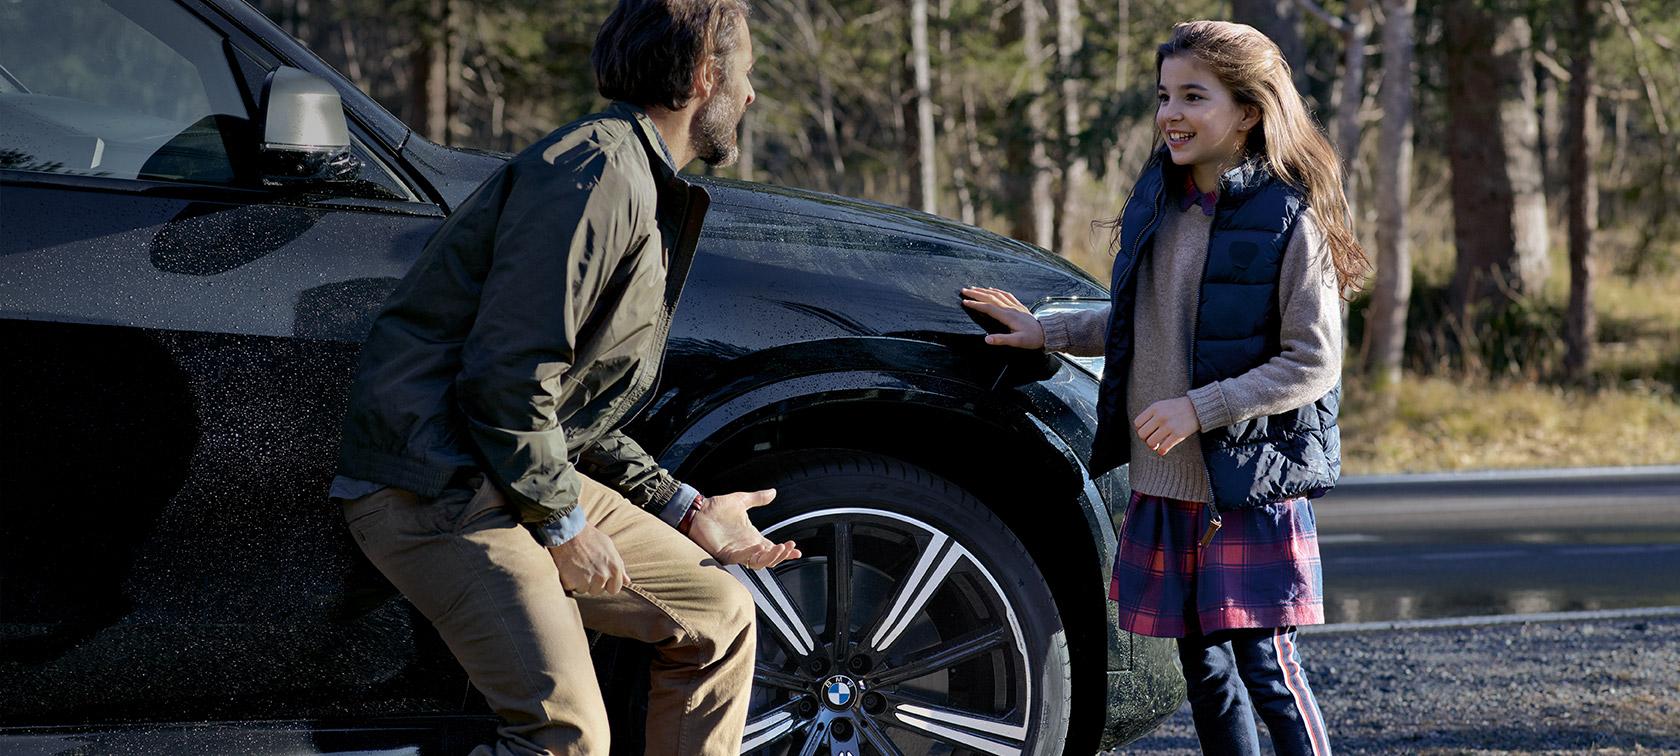 online retailer 6b0c4 5f7f2 BMW bilar   BMW Sverige